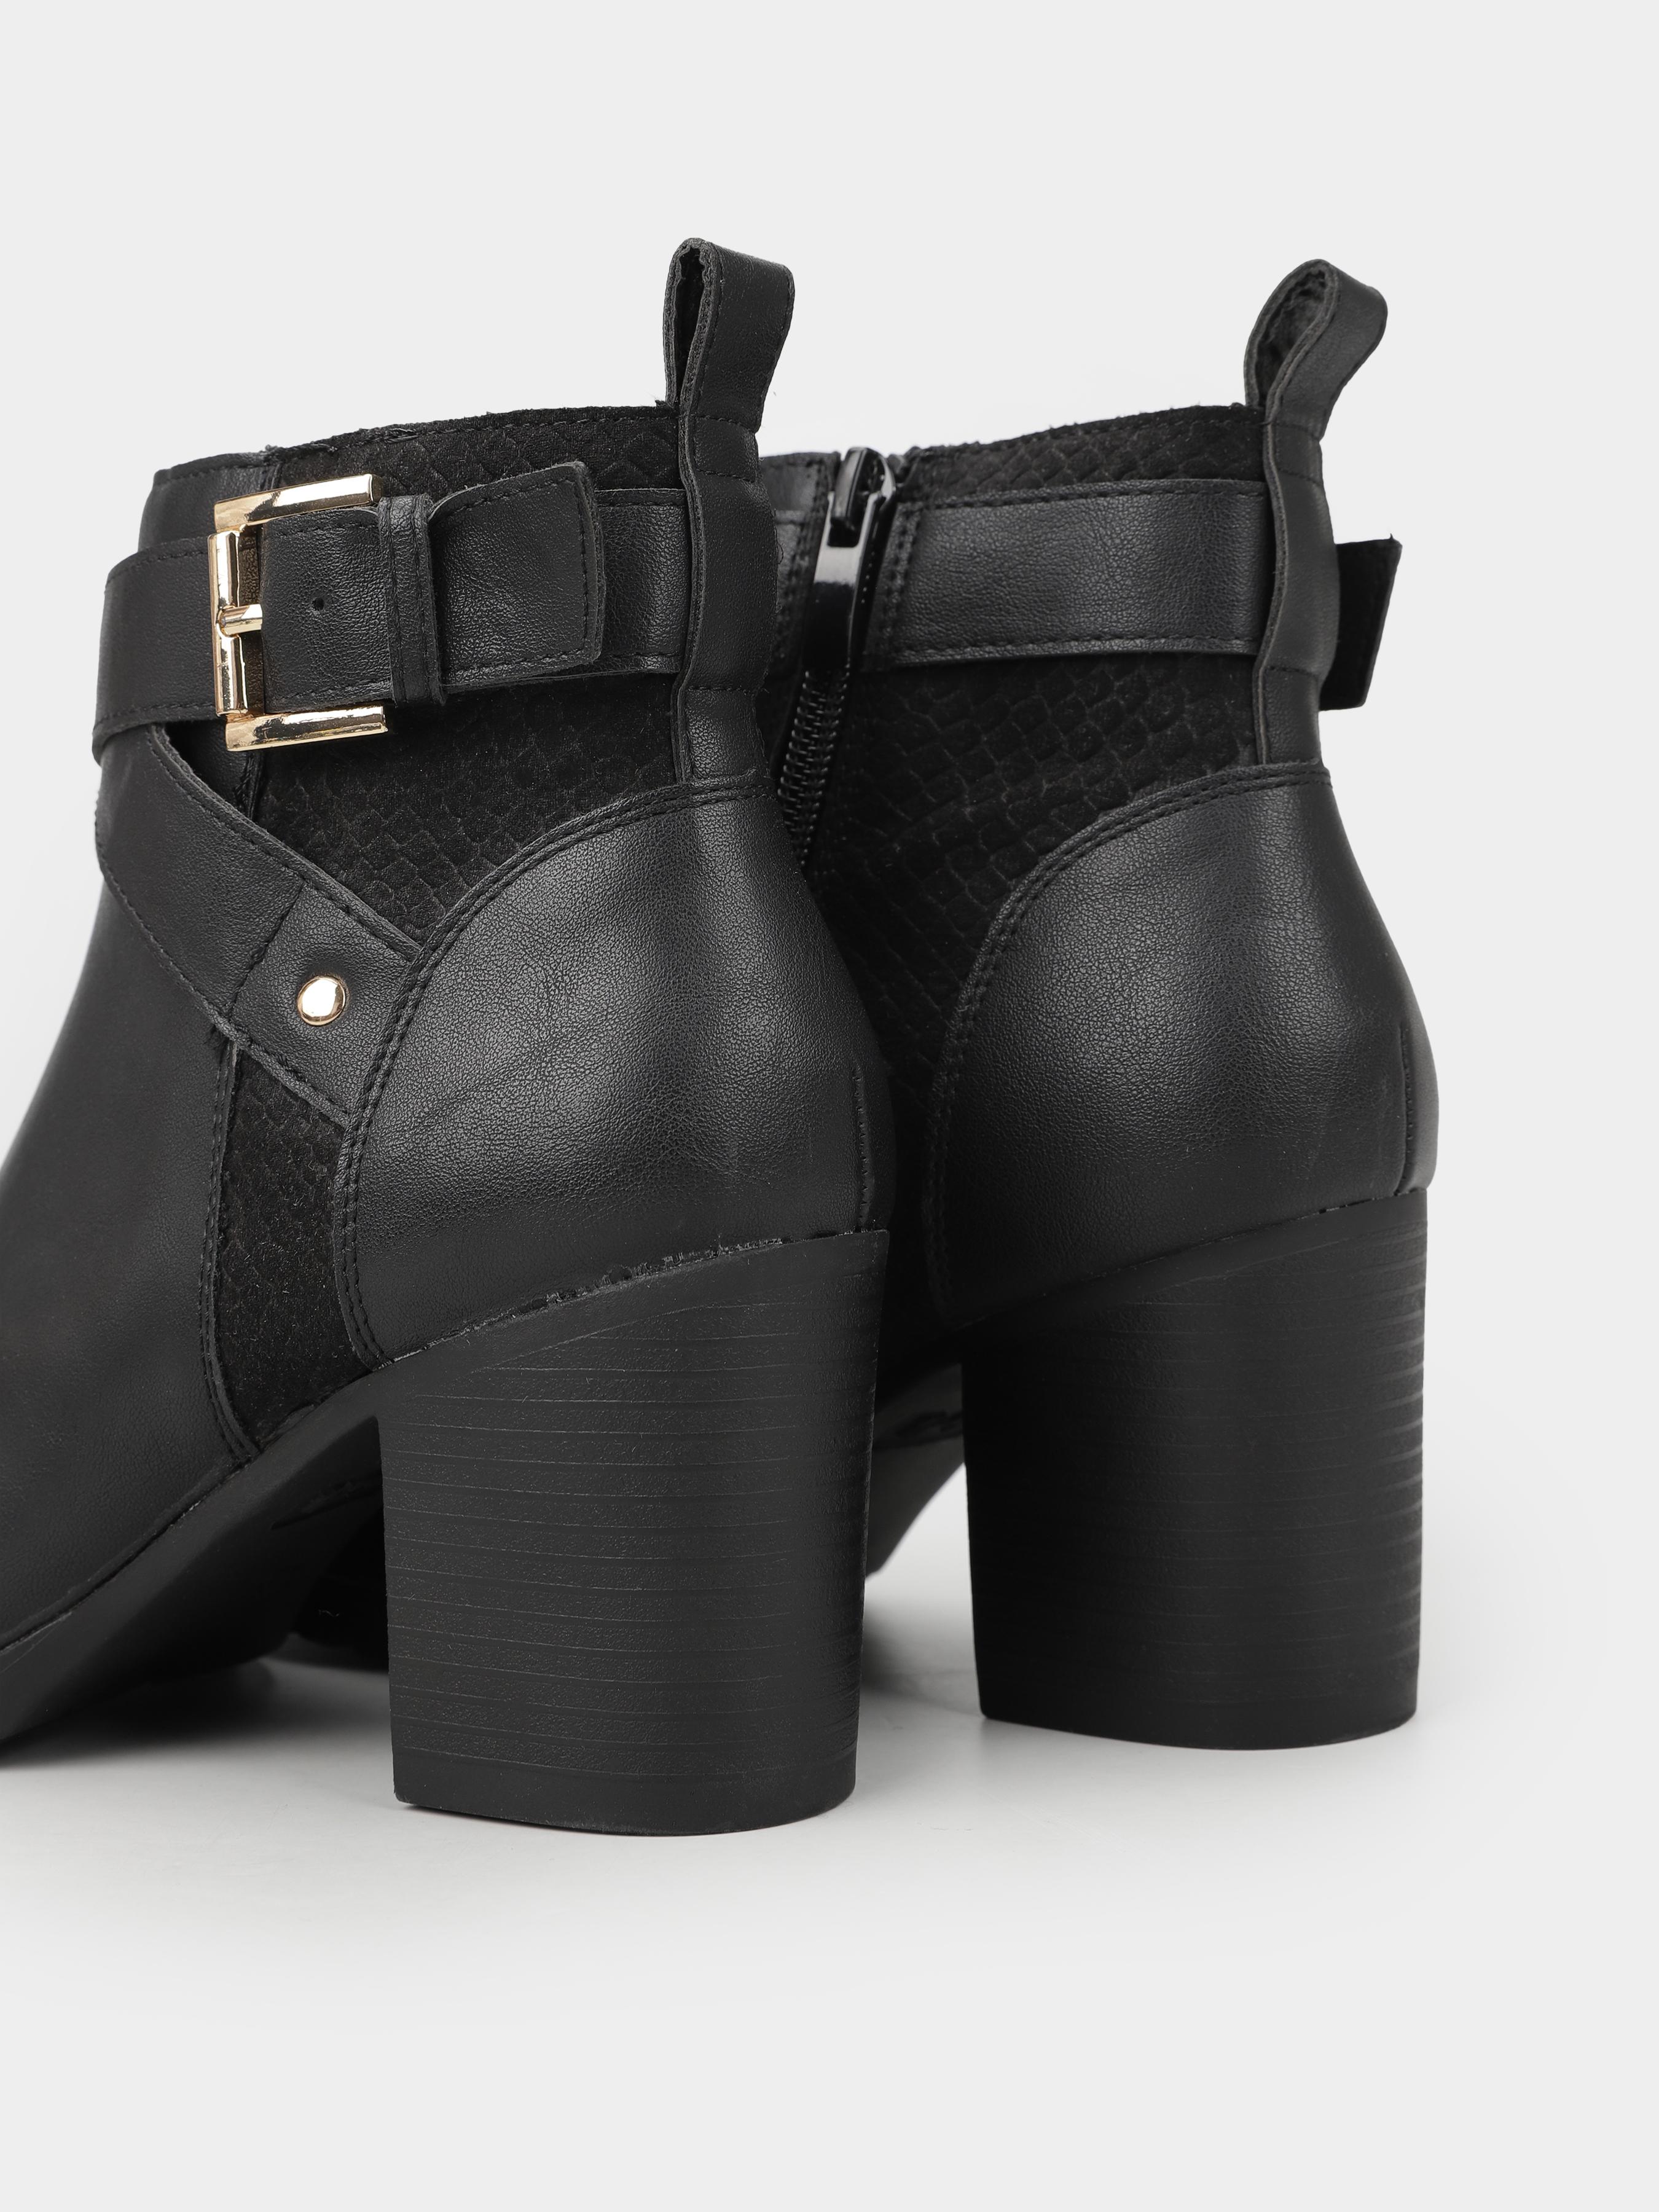 Ботинки для женщин M Wone OI153 размеры обуви, 2017